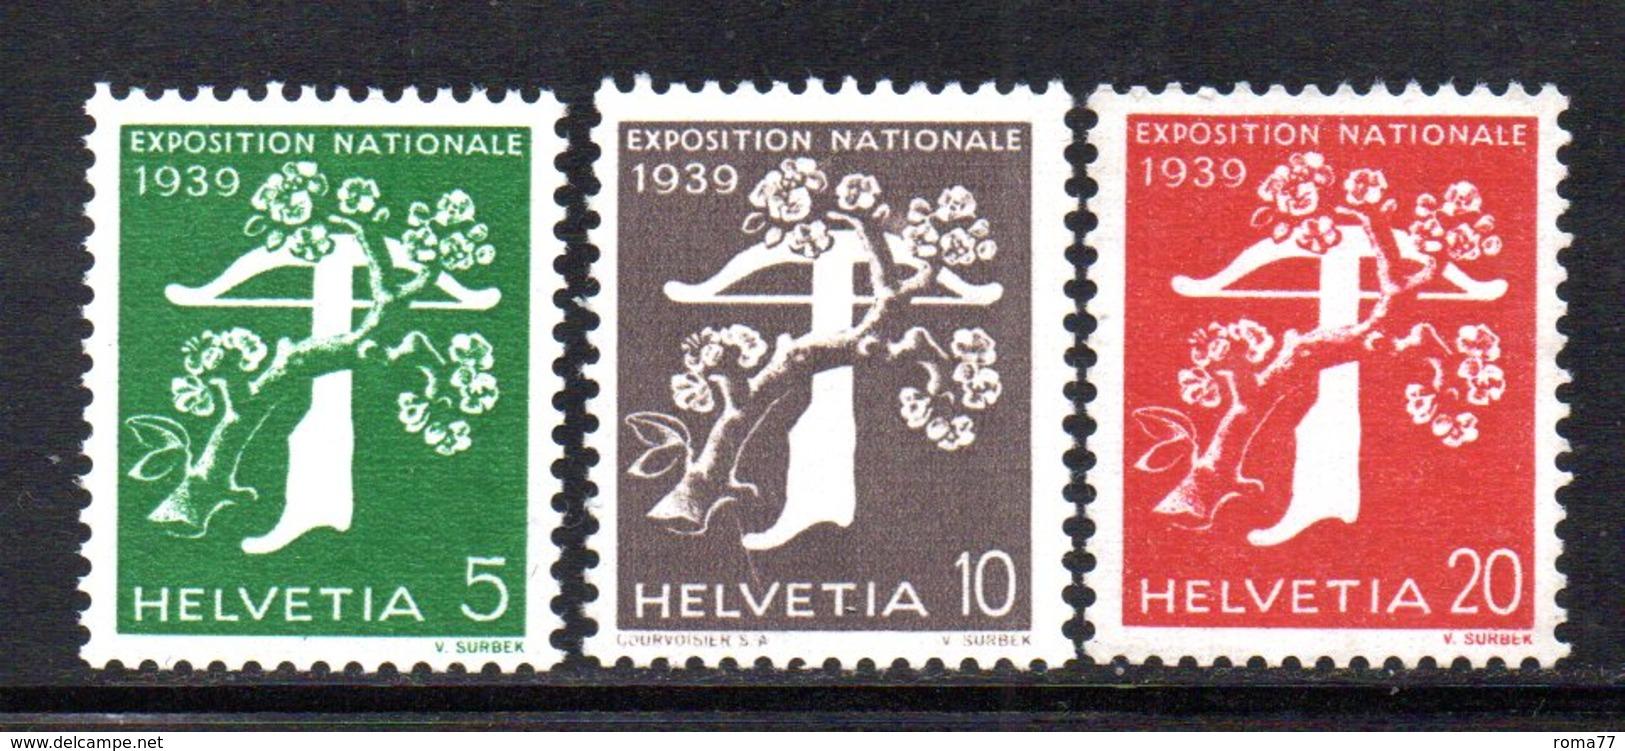 477/1500 - SVIZZERA 1939 , Unificato N. 329A/331A  ***  MNH.  Leggenda Francese  Carta Goffrata - Nuovi